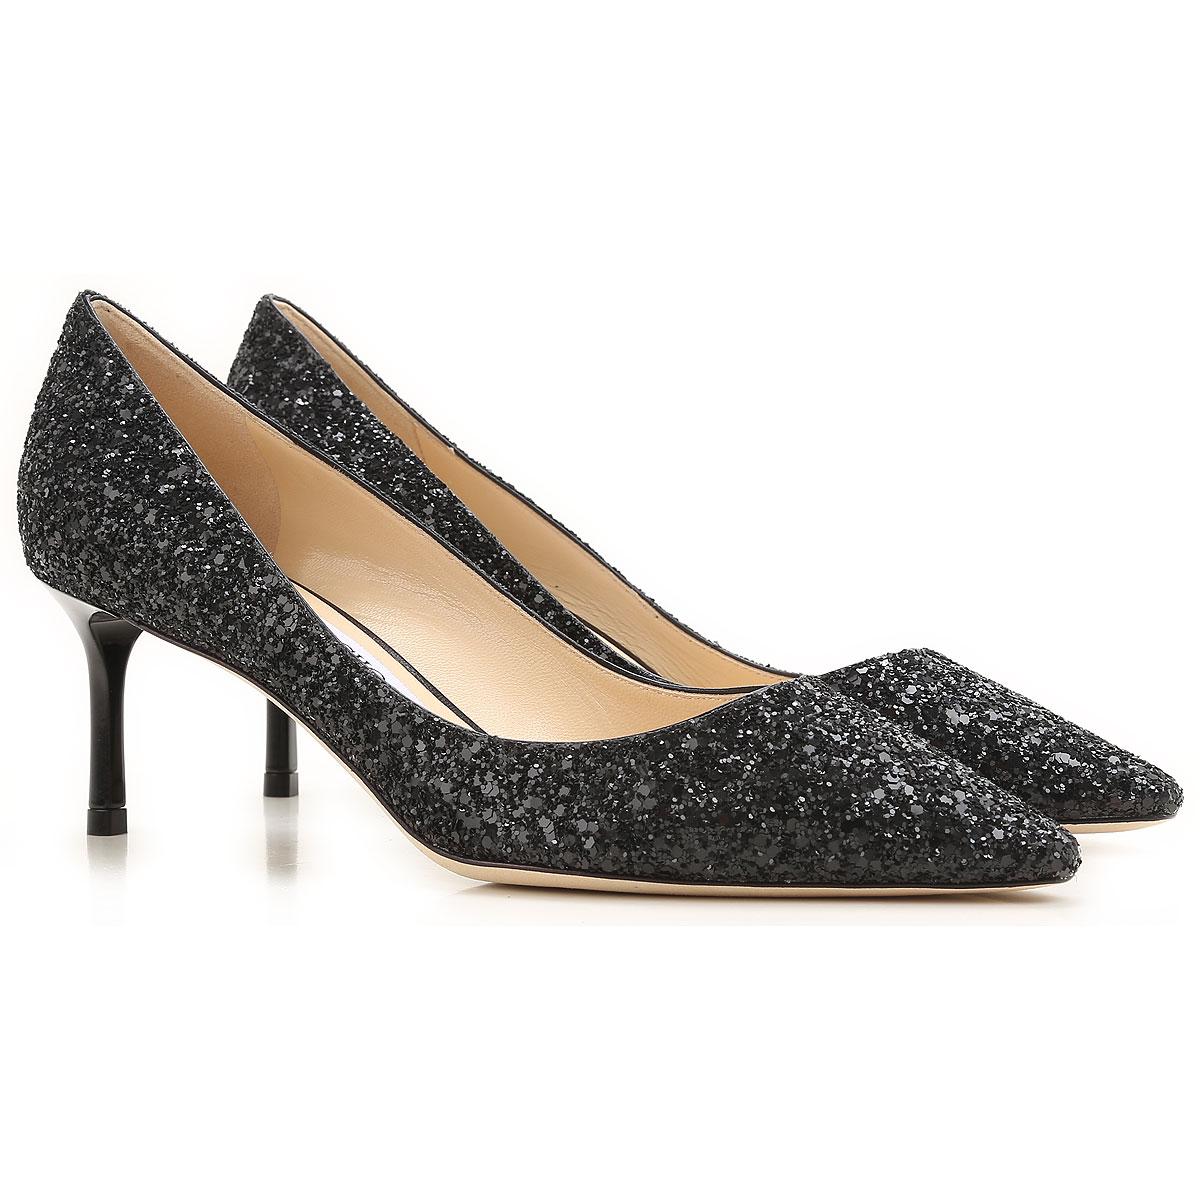 chaussures femme jimmy choo code produit romy 60 cgf. Black Bedroom Furniture Sets. Home Design Ideas